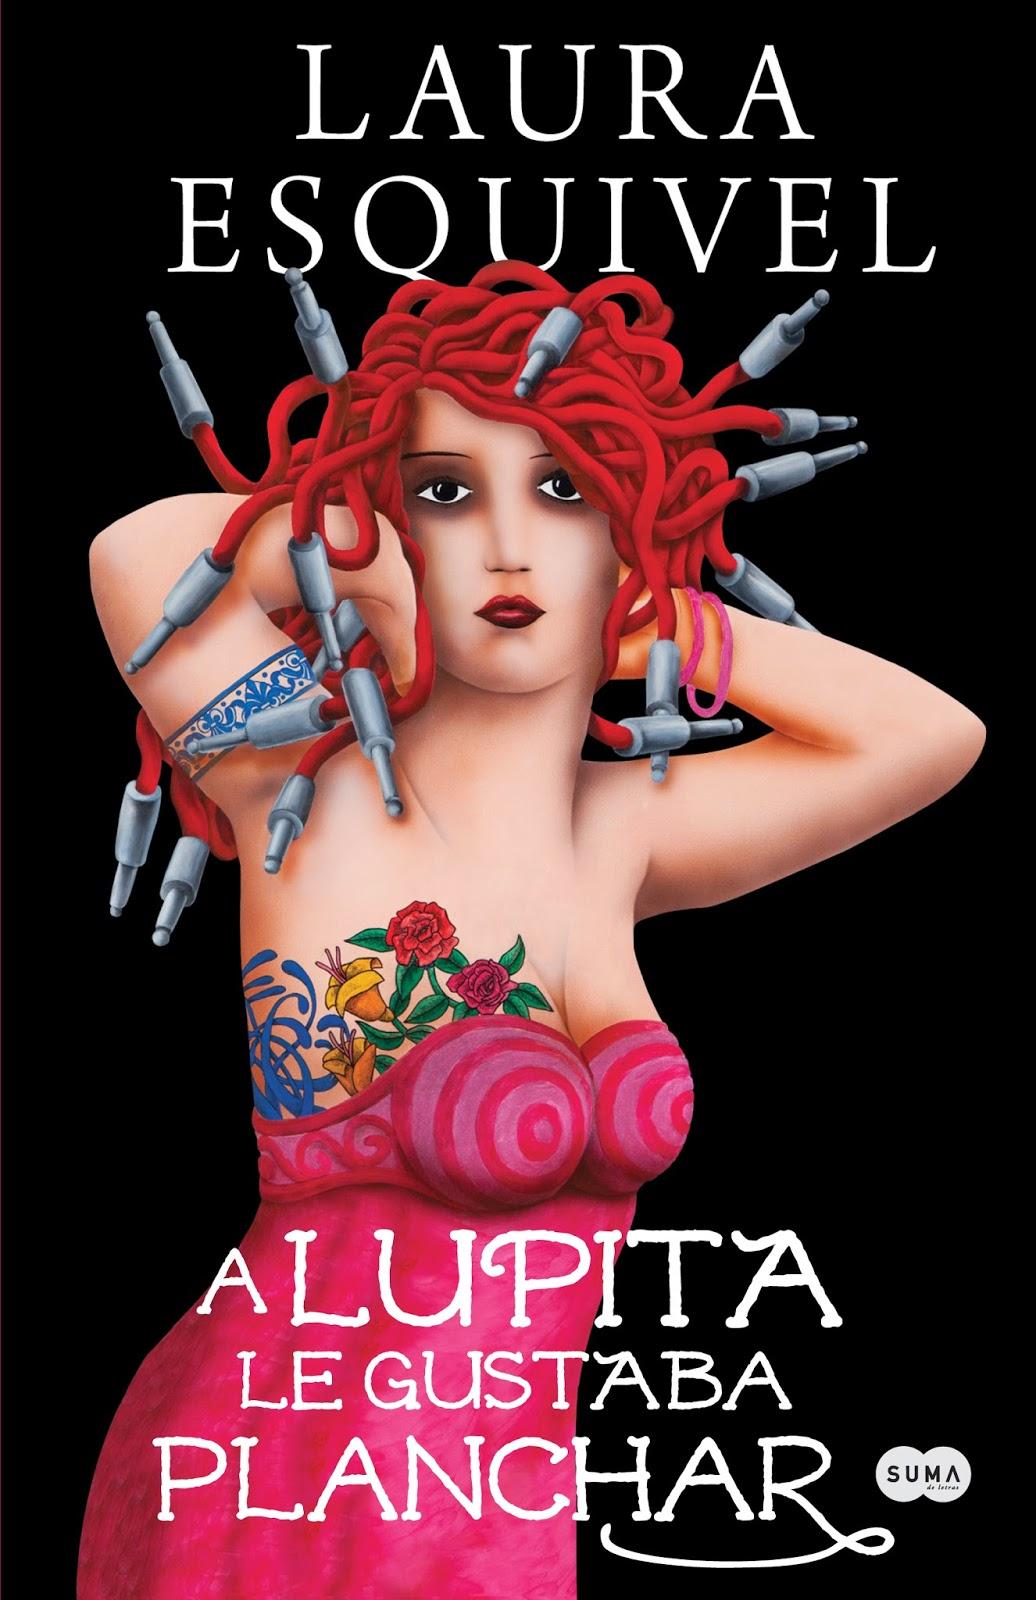 A Lupita le gusta planchar - Laura Esquivel